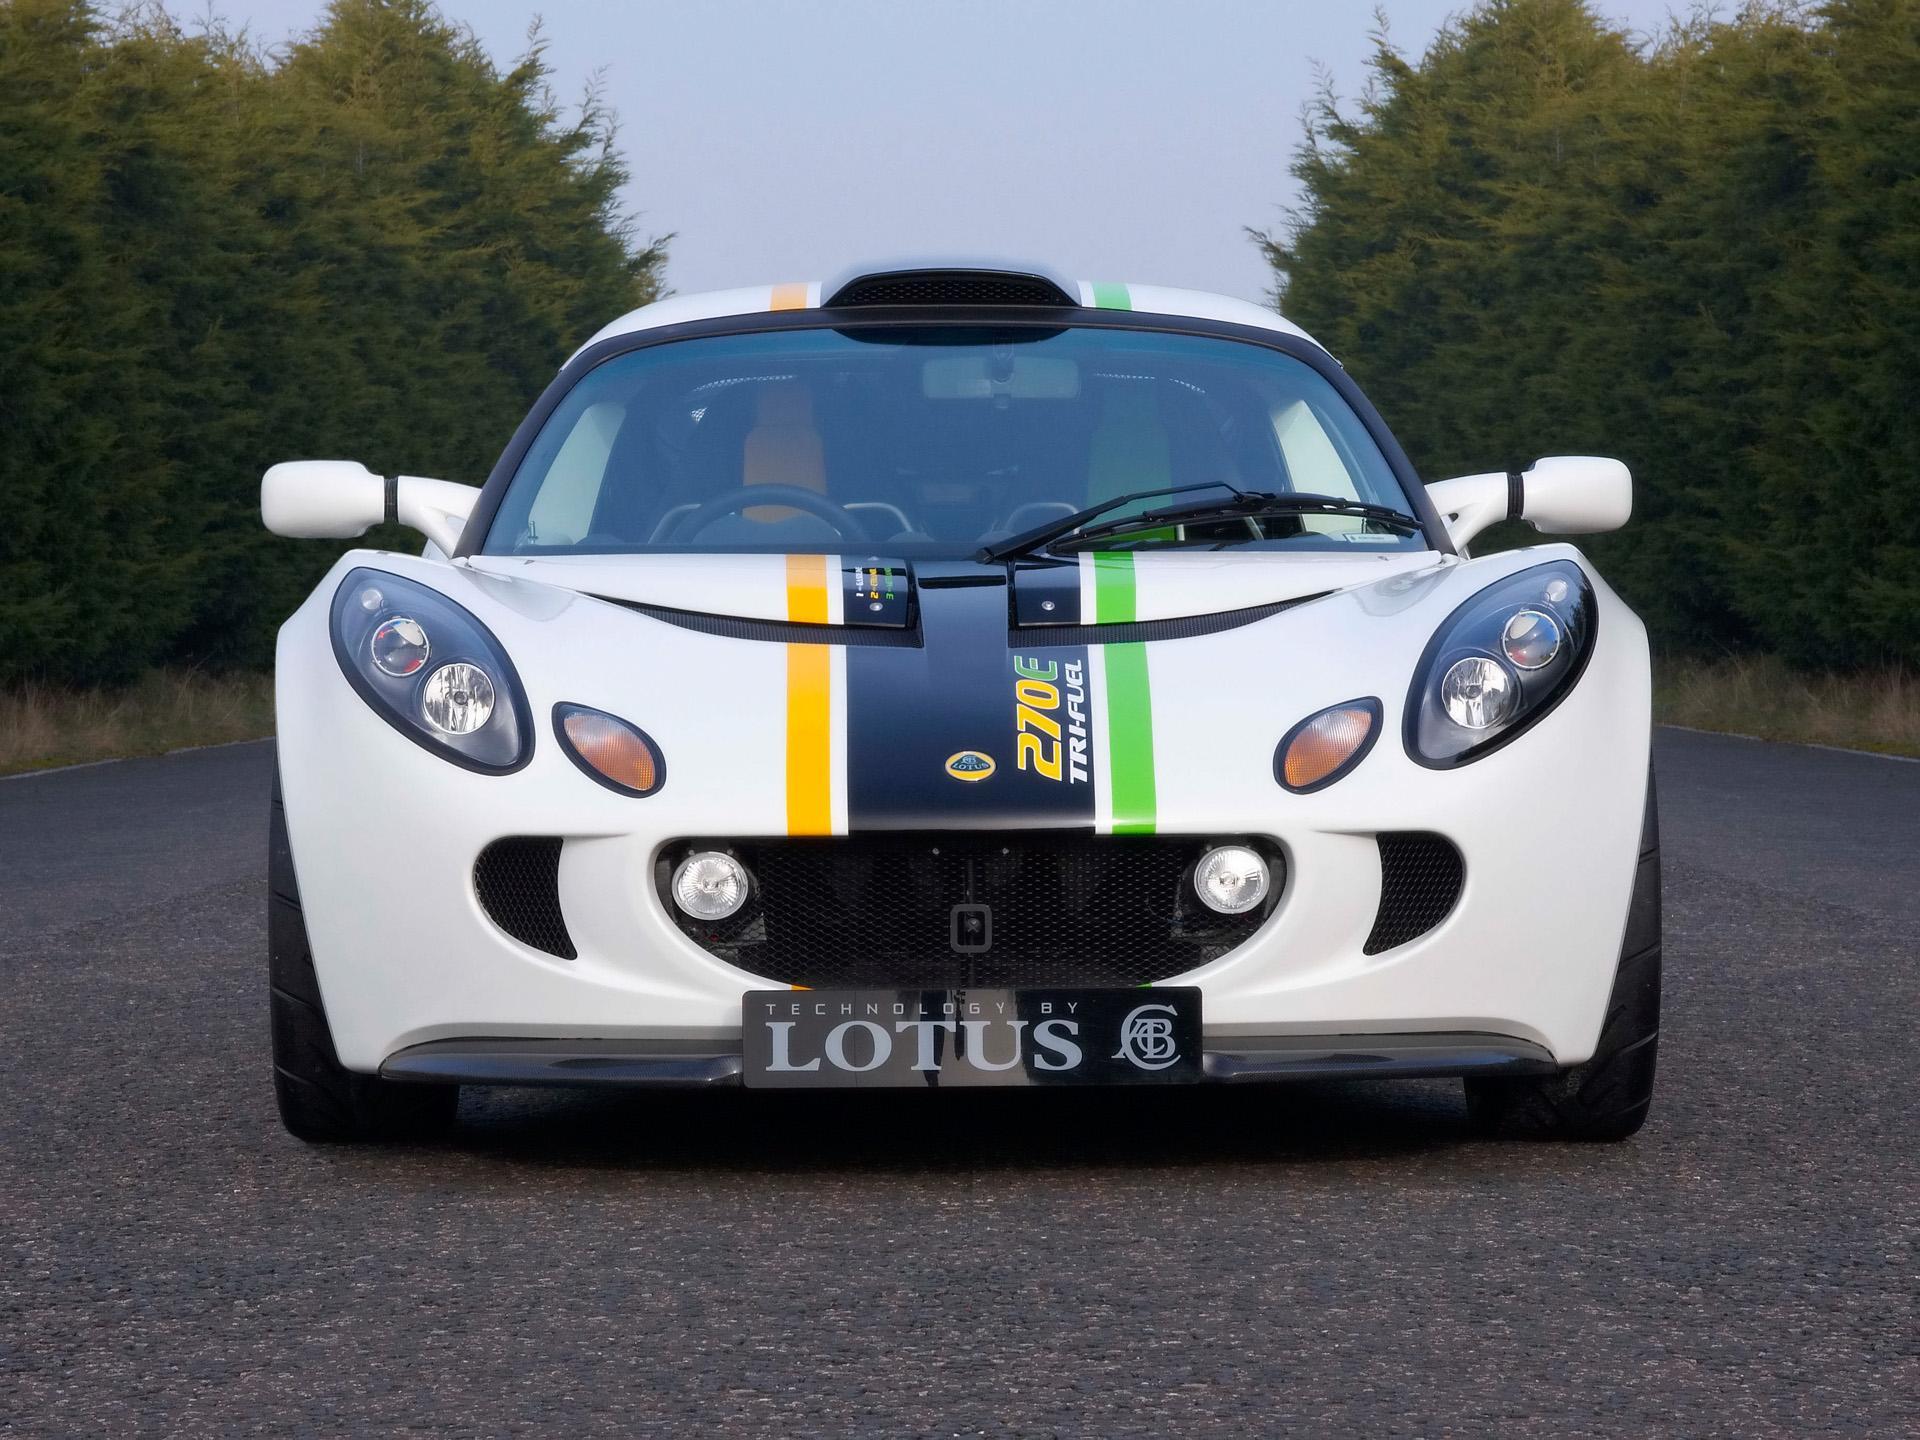 https://www.conceptcarz.com/images/Lotus/08-Lotus-Exige-270E-TriFuel-Concept-01.jpg